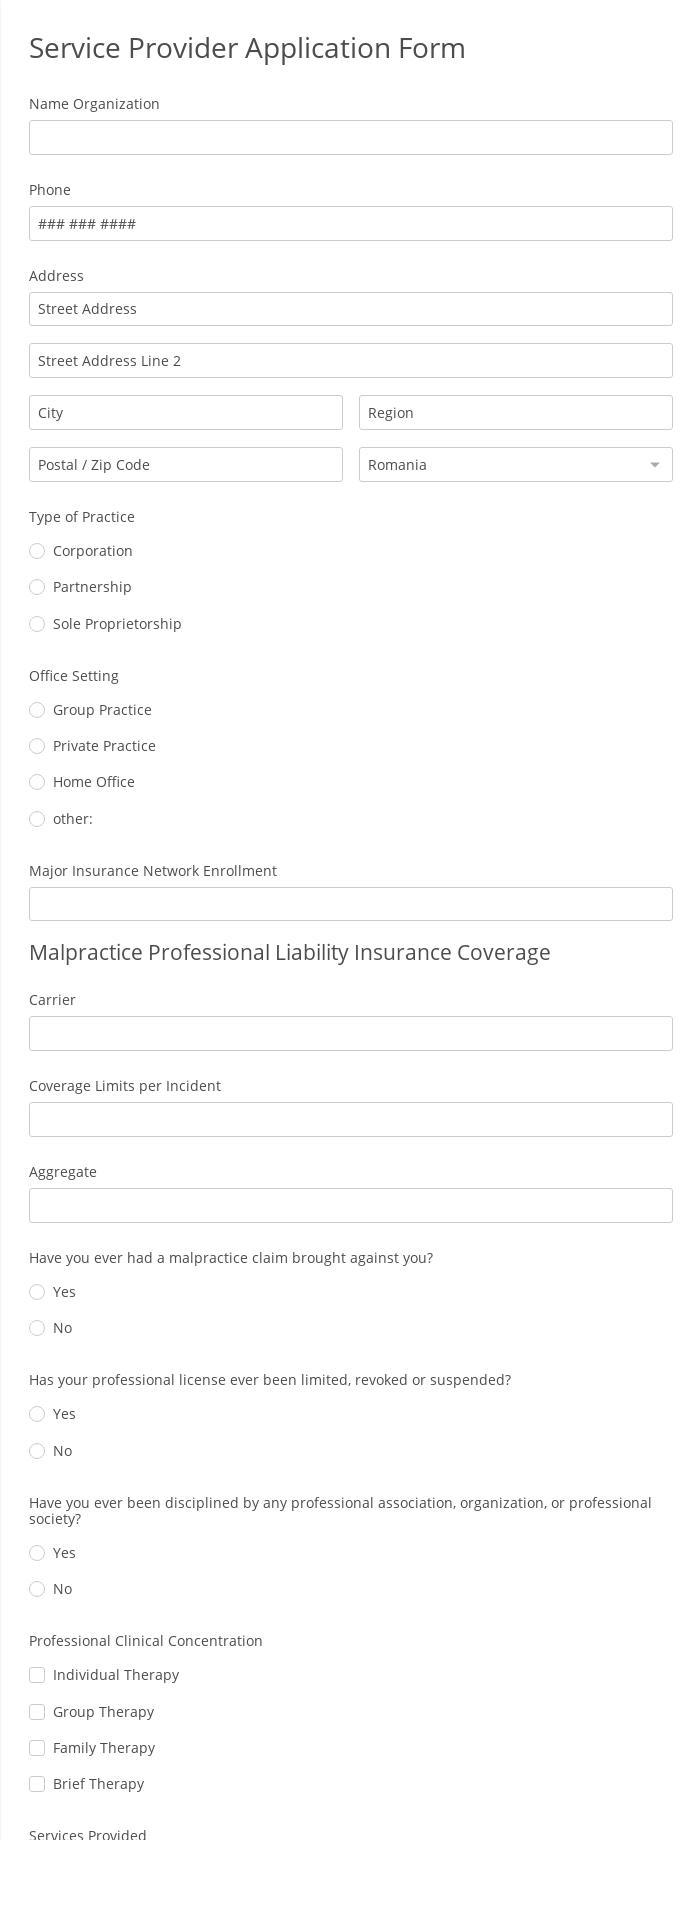 Service Provider Application Form